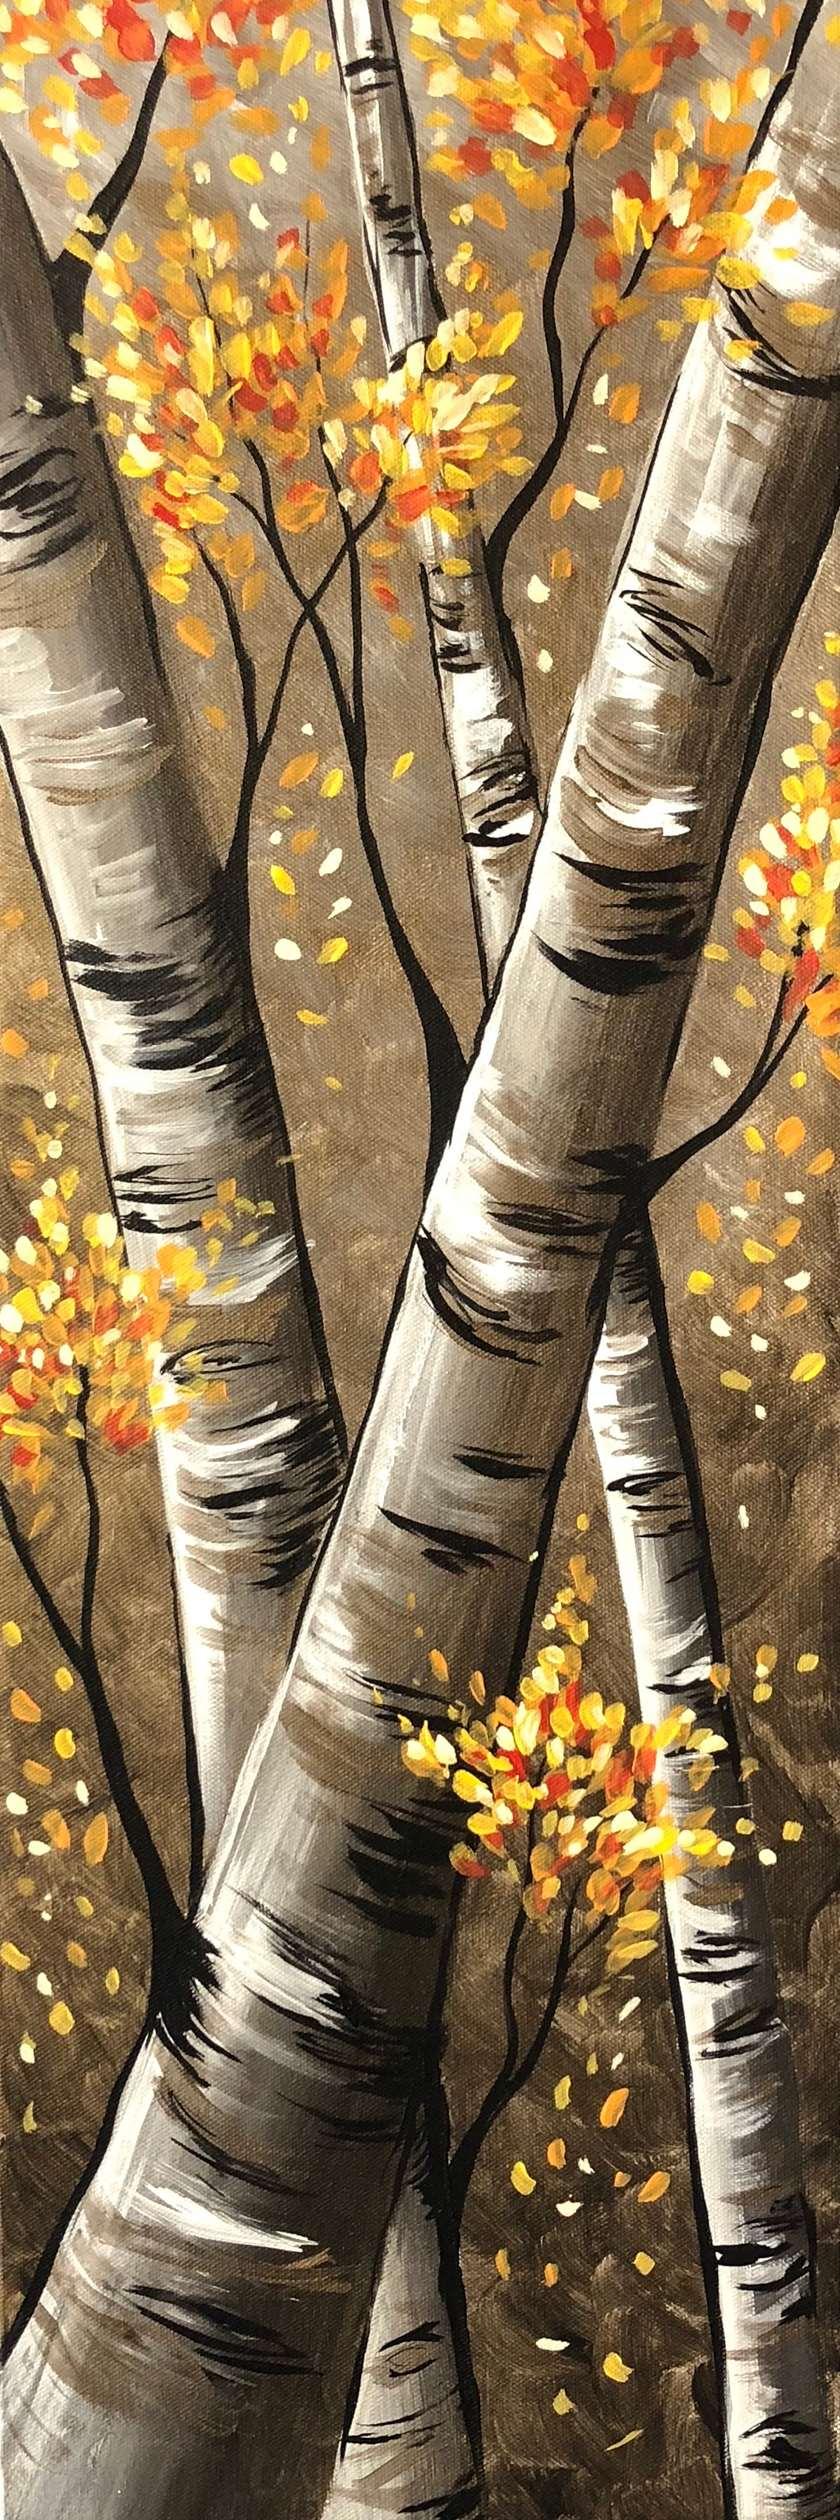 Autumn Birch Trees - 10x30 Canvas - $10 Off Bottles of Wine